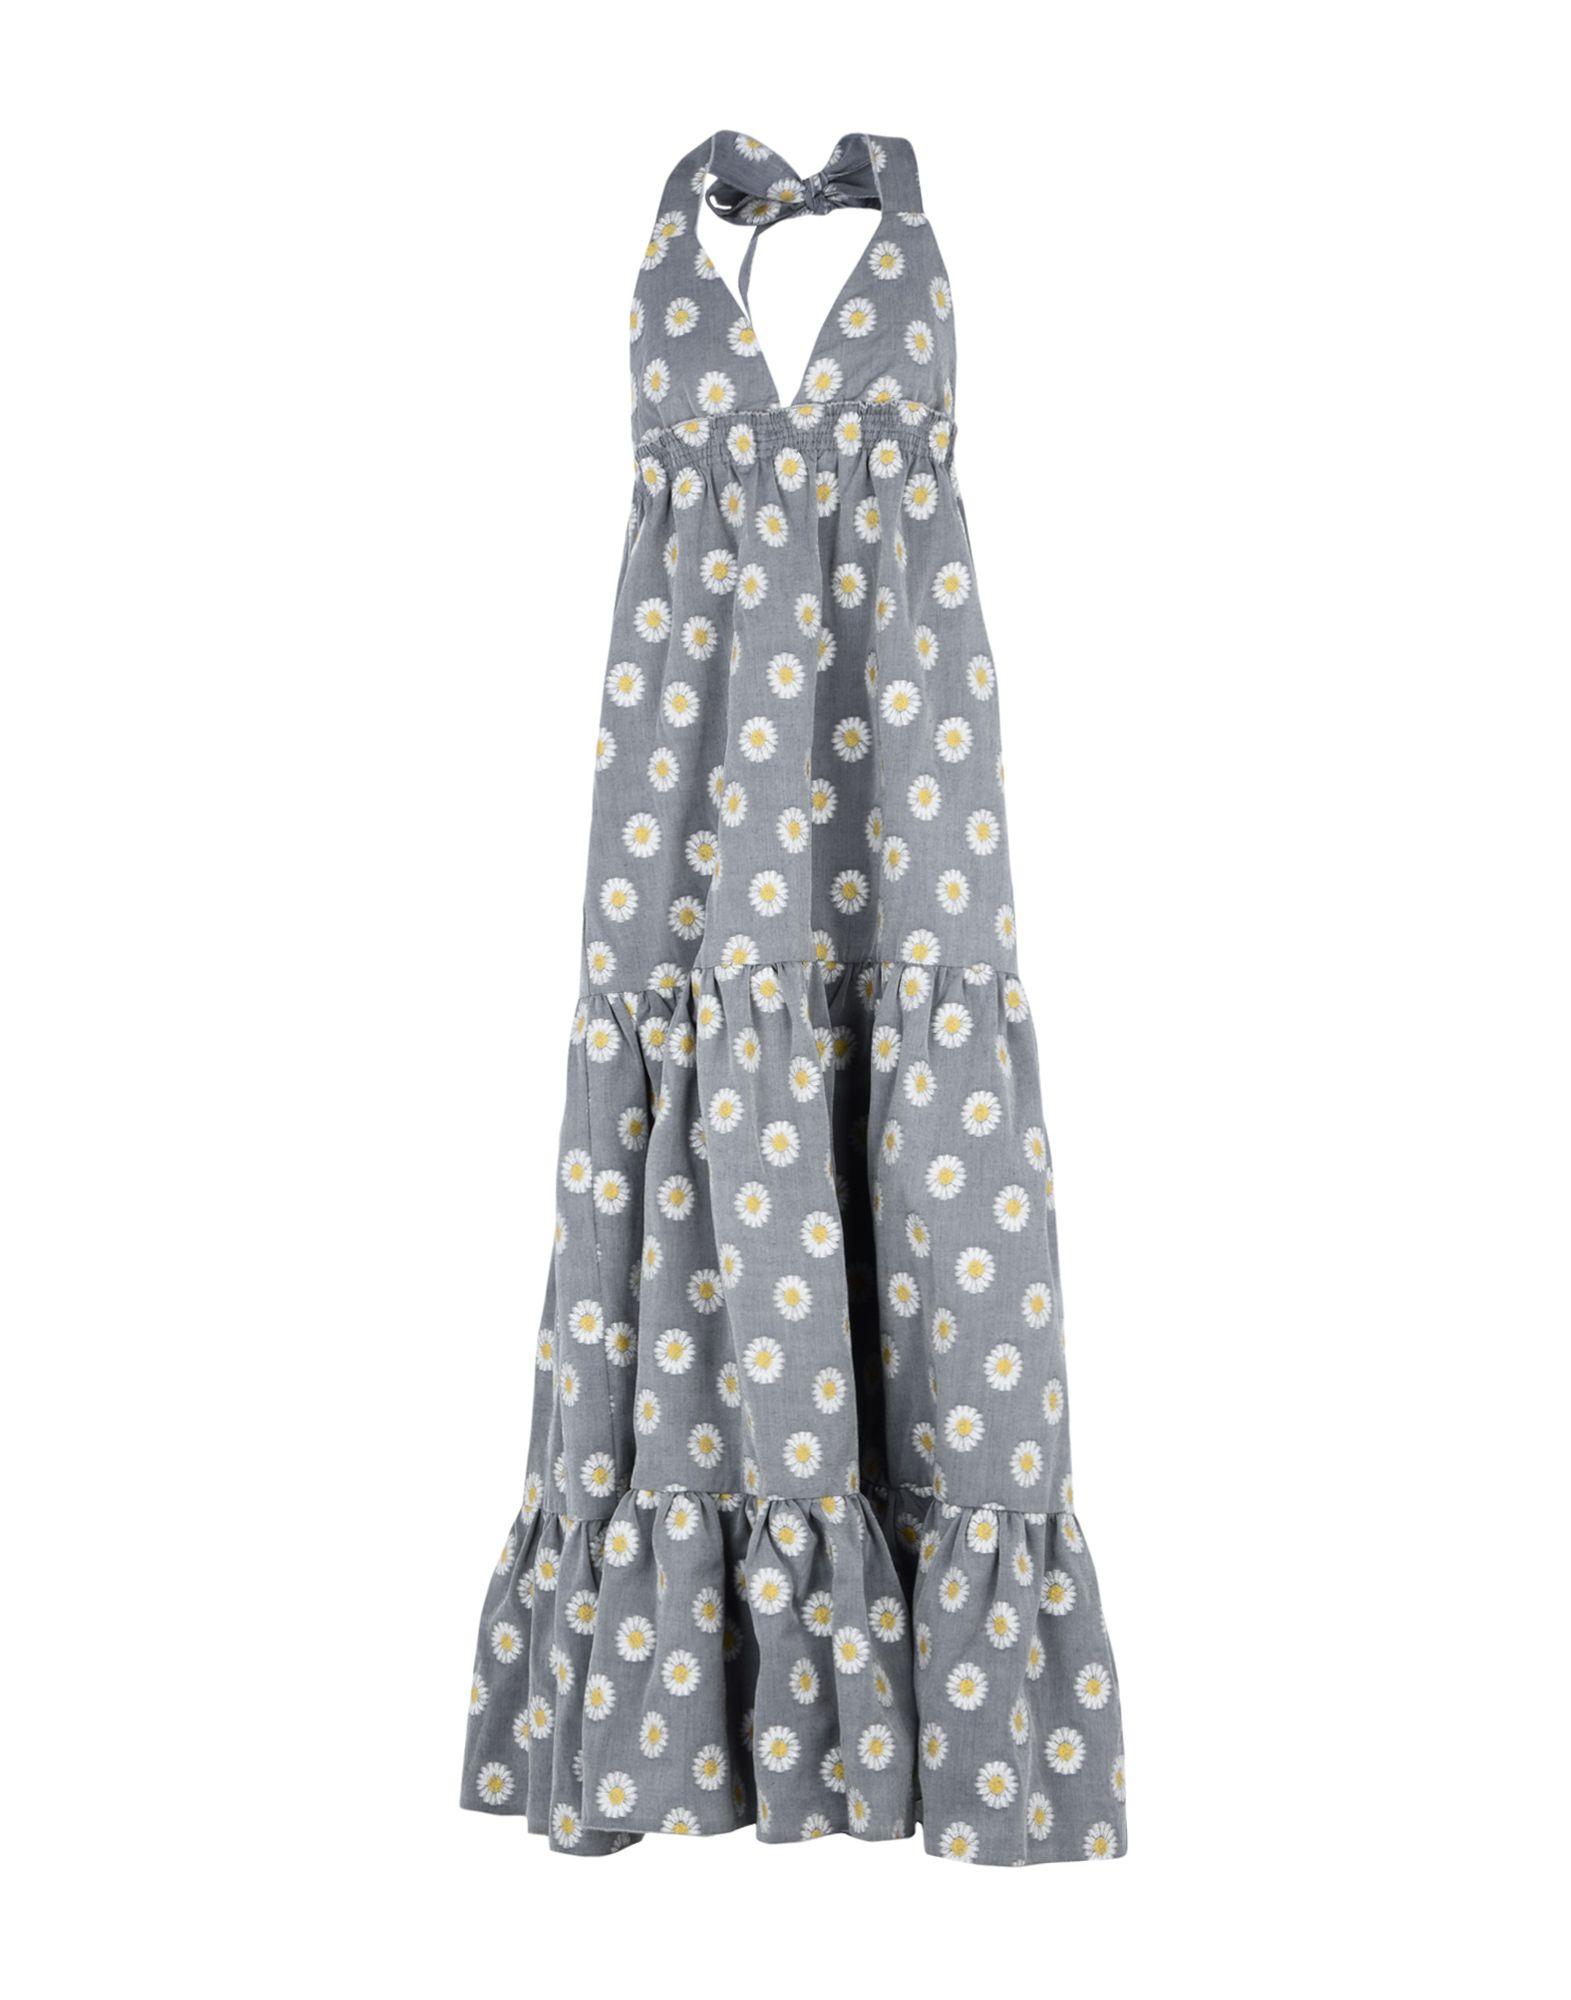 ULTRA'CHIC Платье длиной 3/4 lisa corti платье длиной 3 4